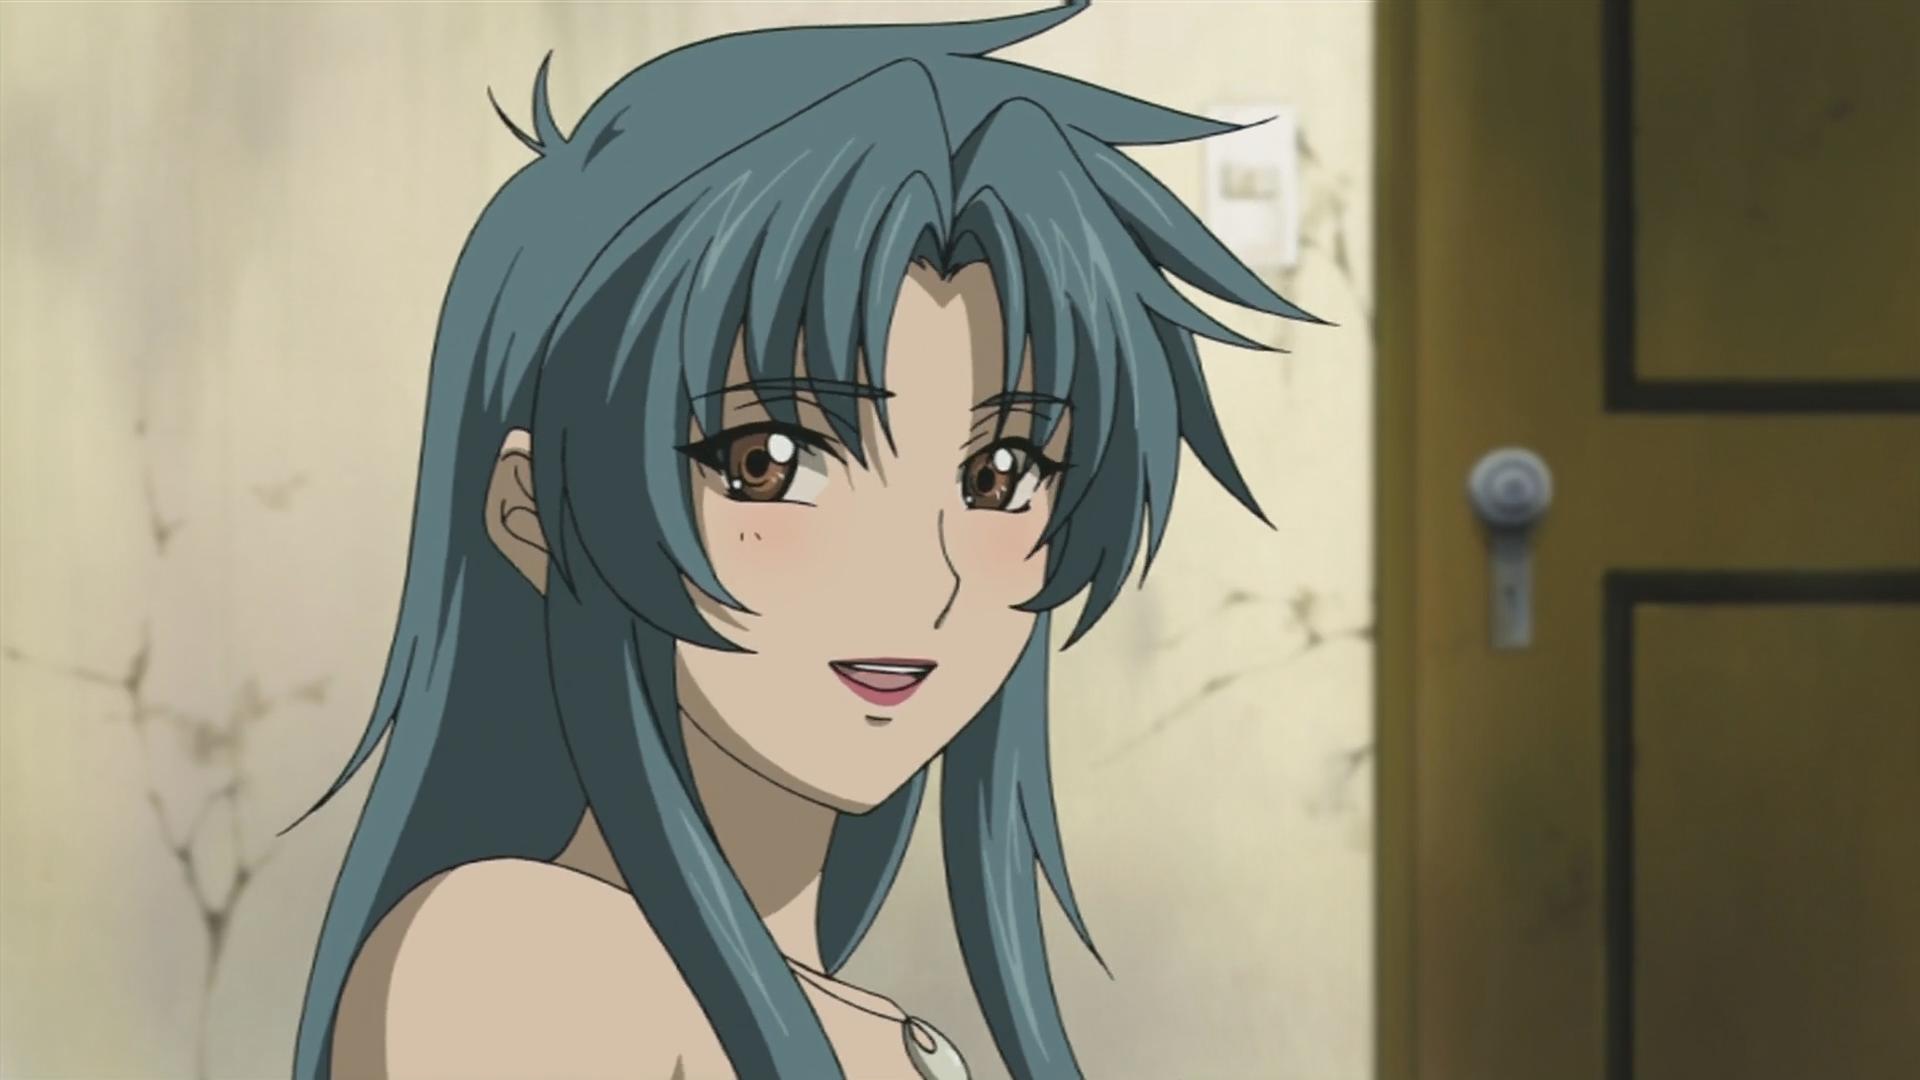 flirting games anime girl 2 characters free